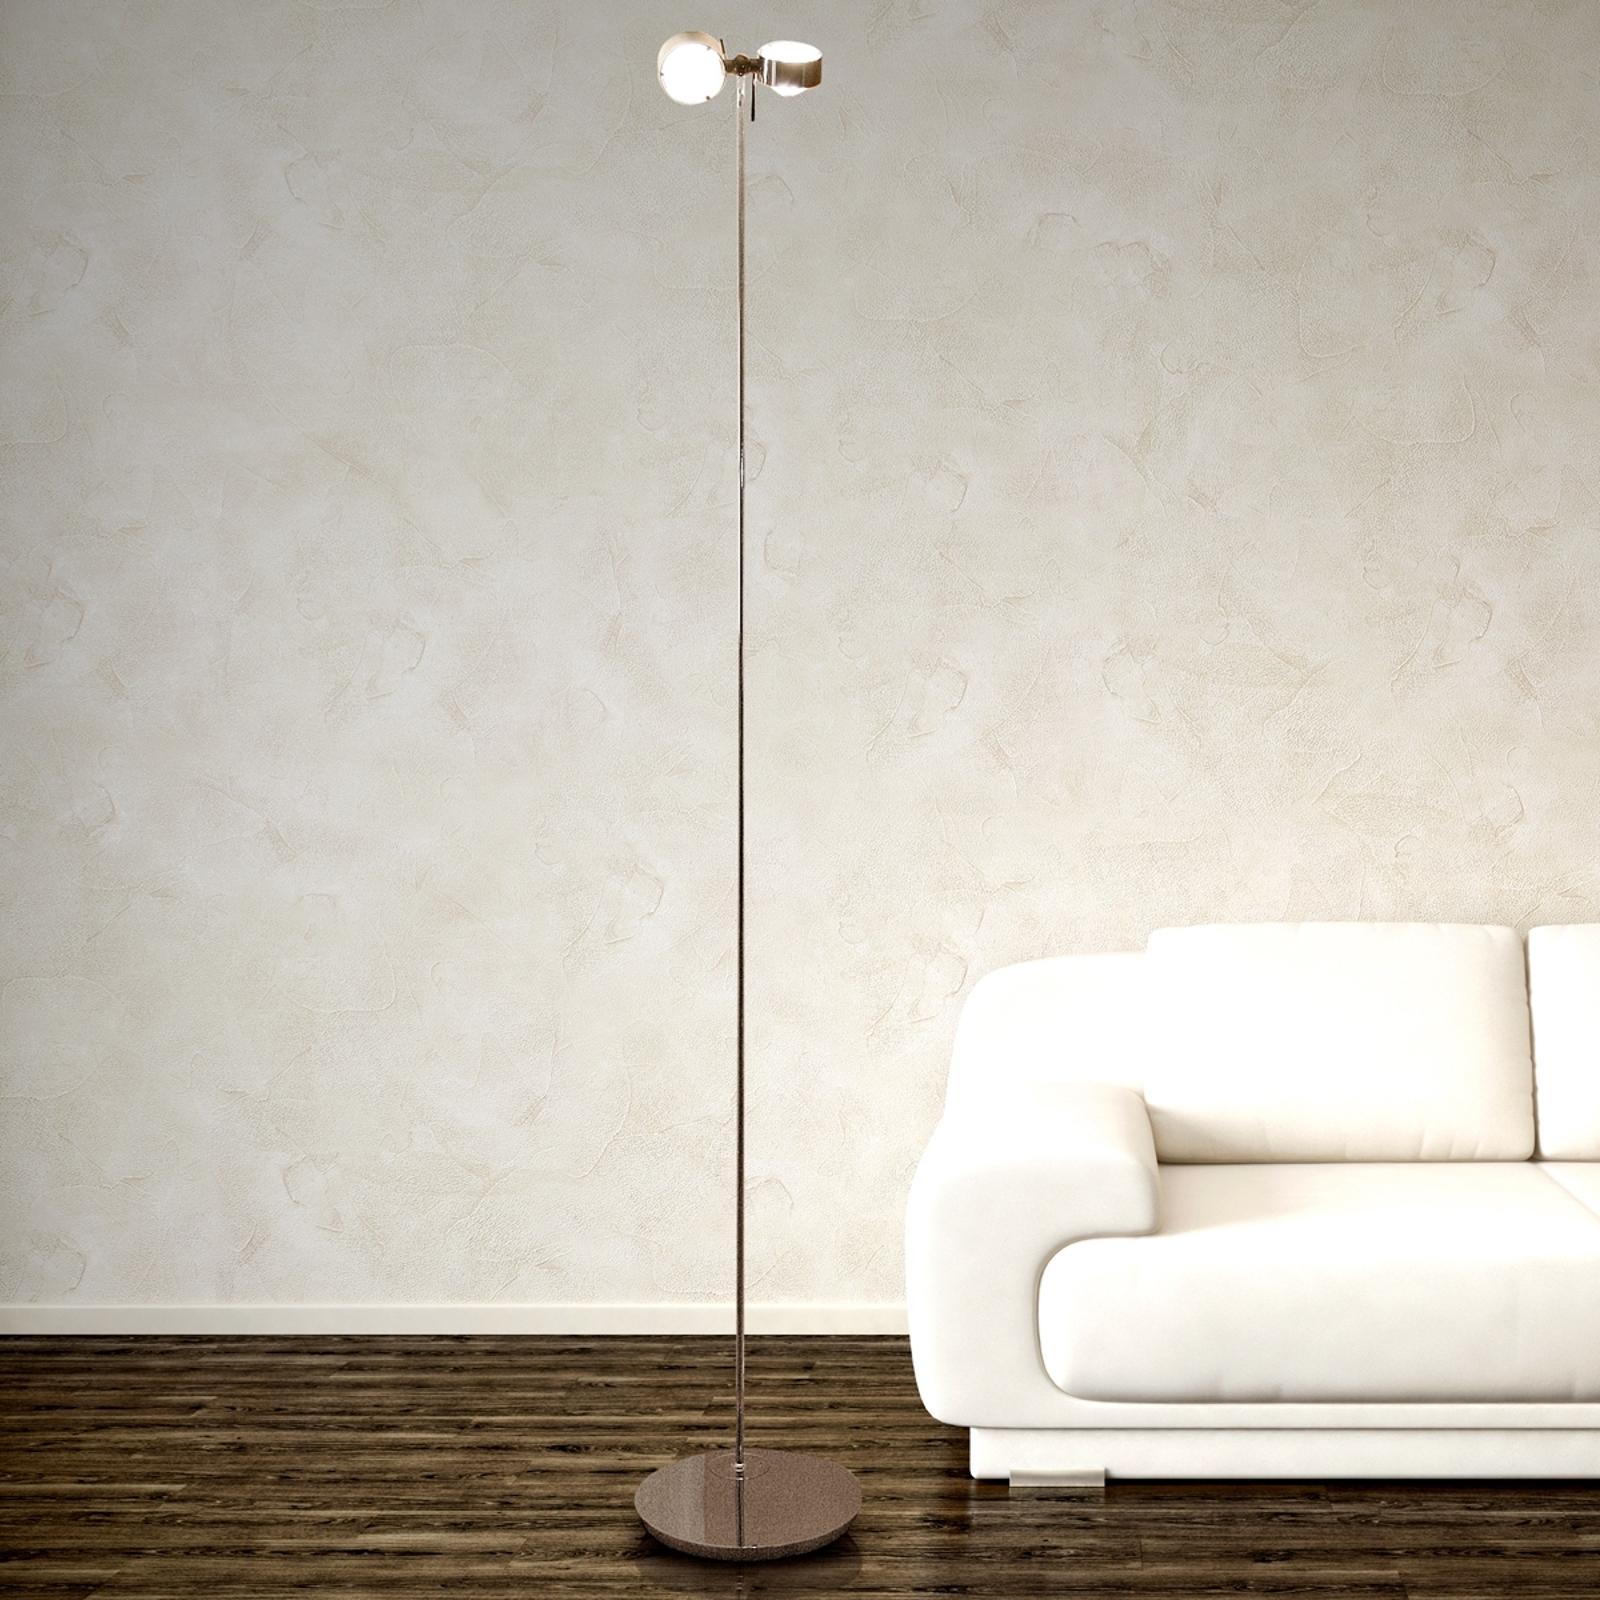 Ruchoma lampa stojąca PUK FLOOR, chrom, 2-pkt.